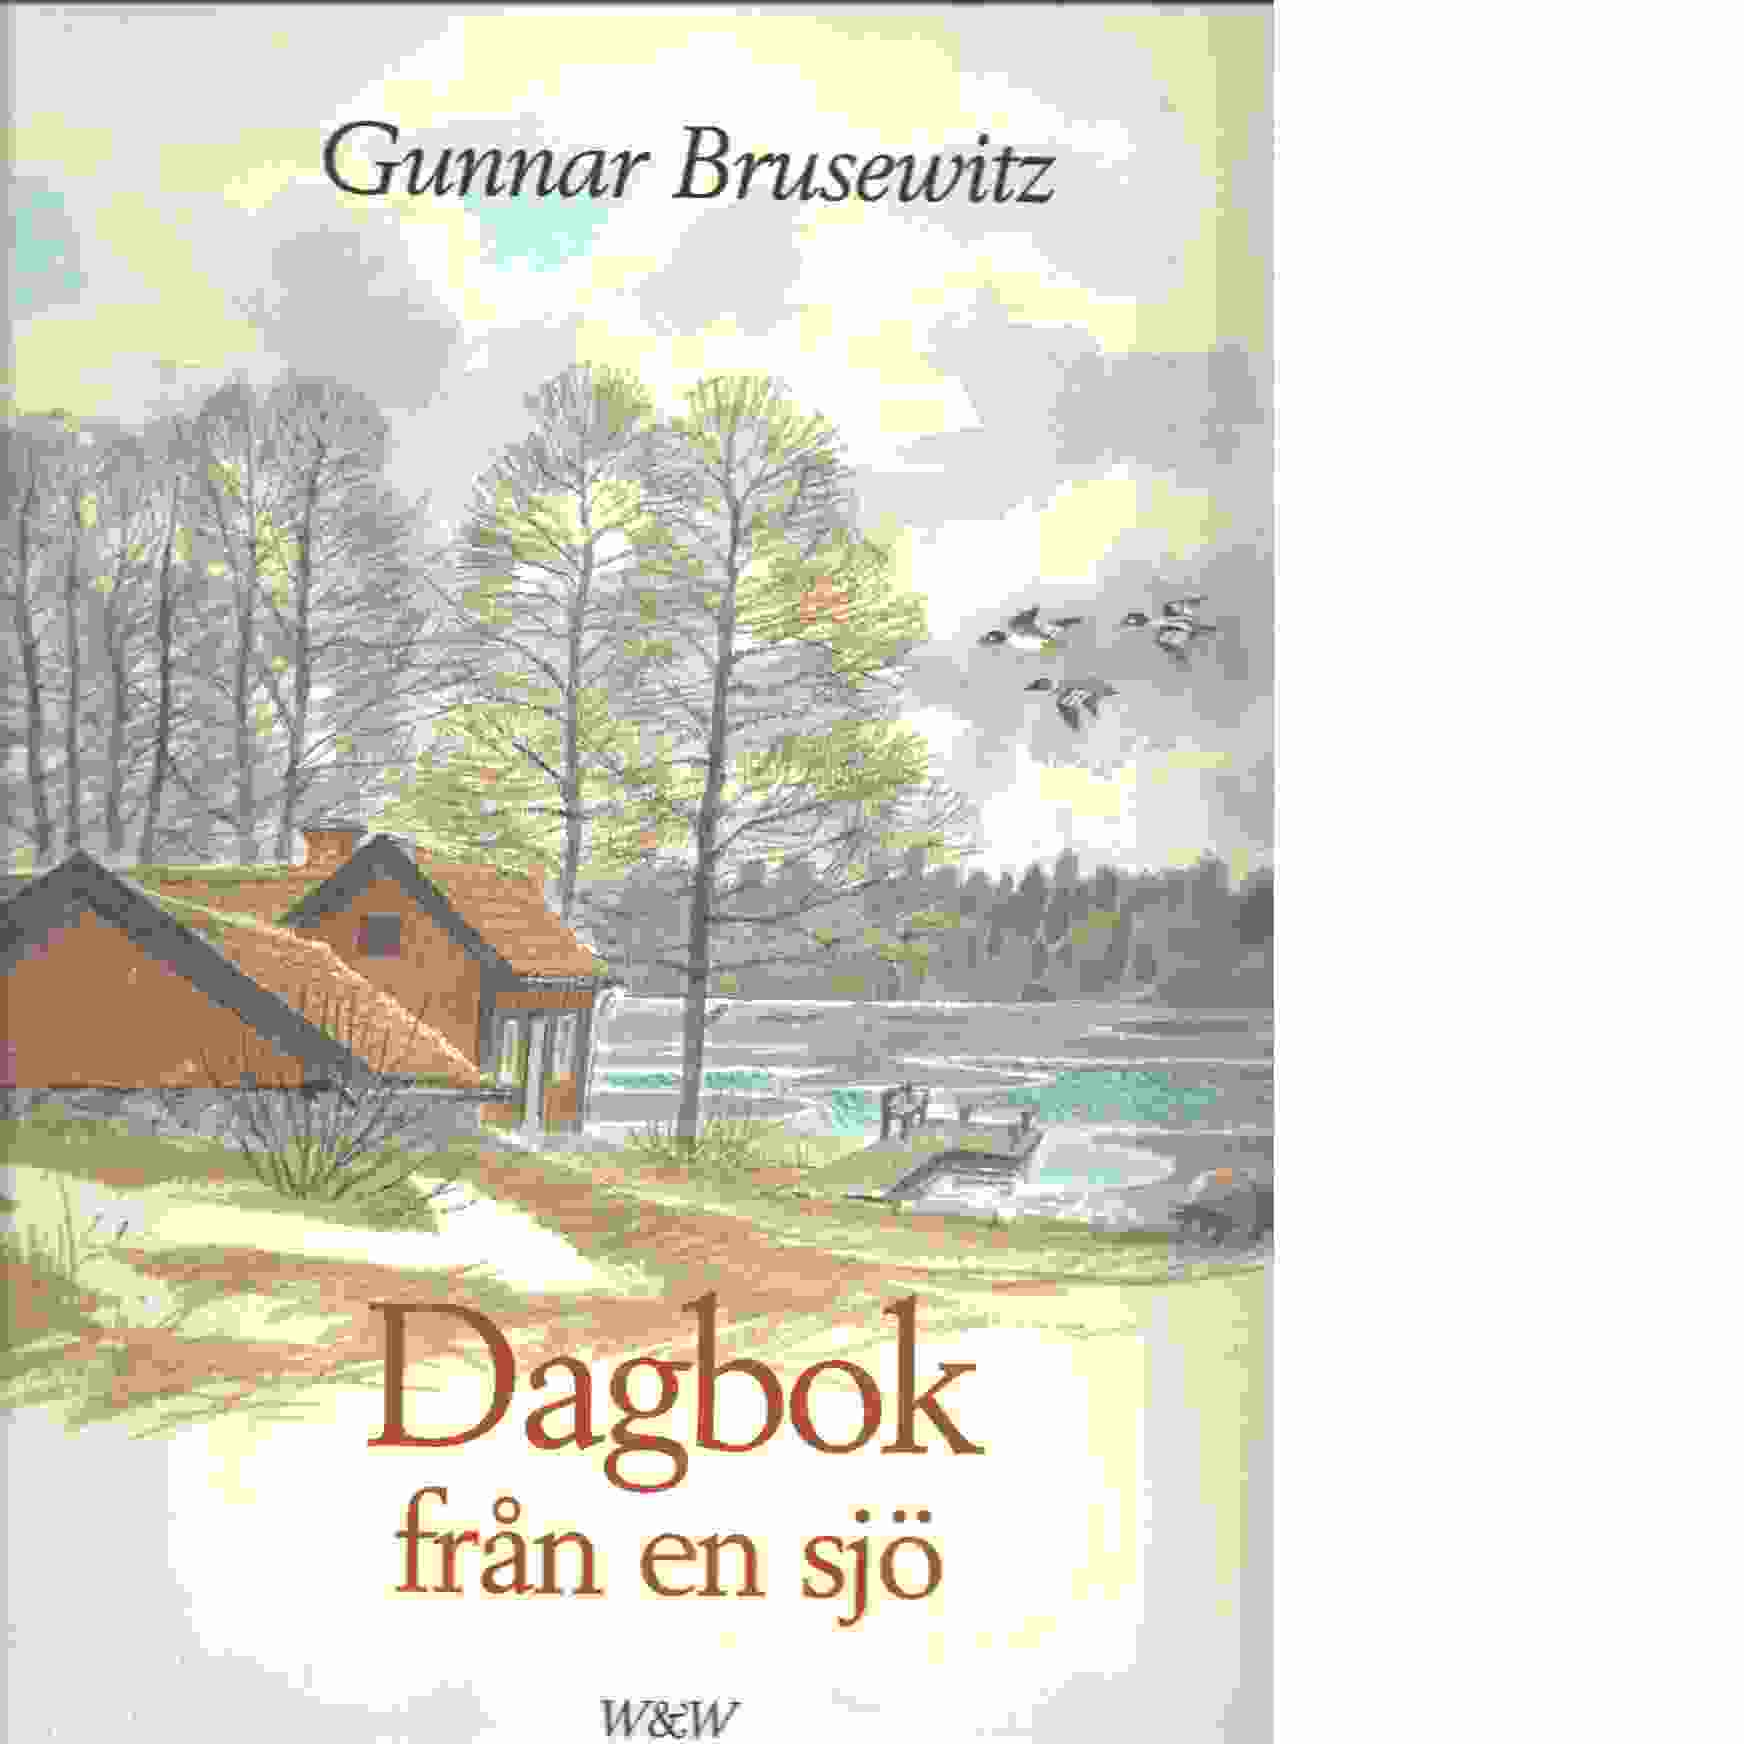 Dagbok från en sjö - Brusewitz, Gunnar